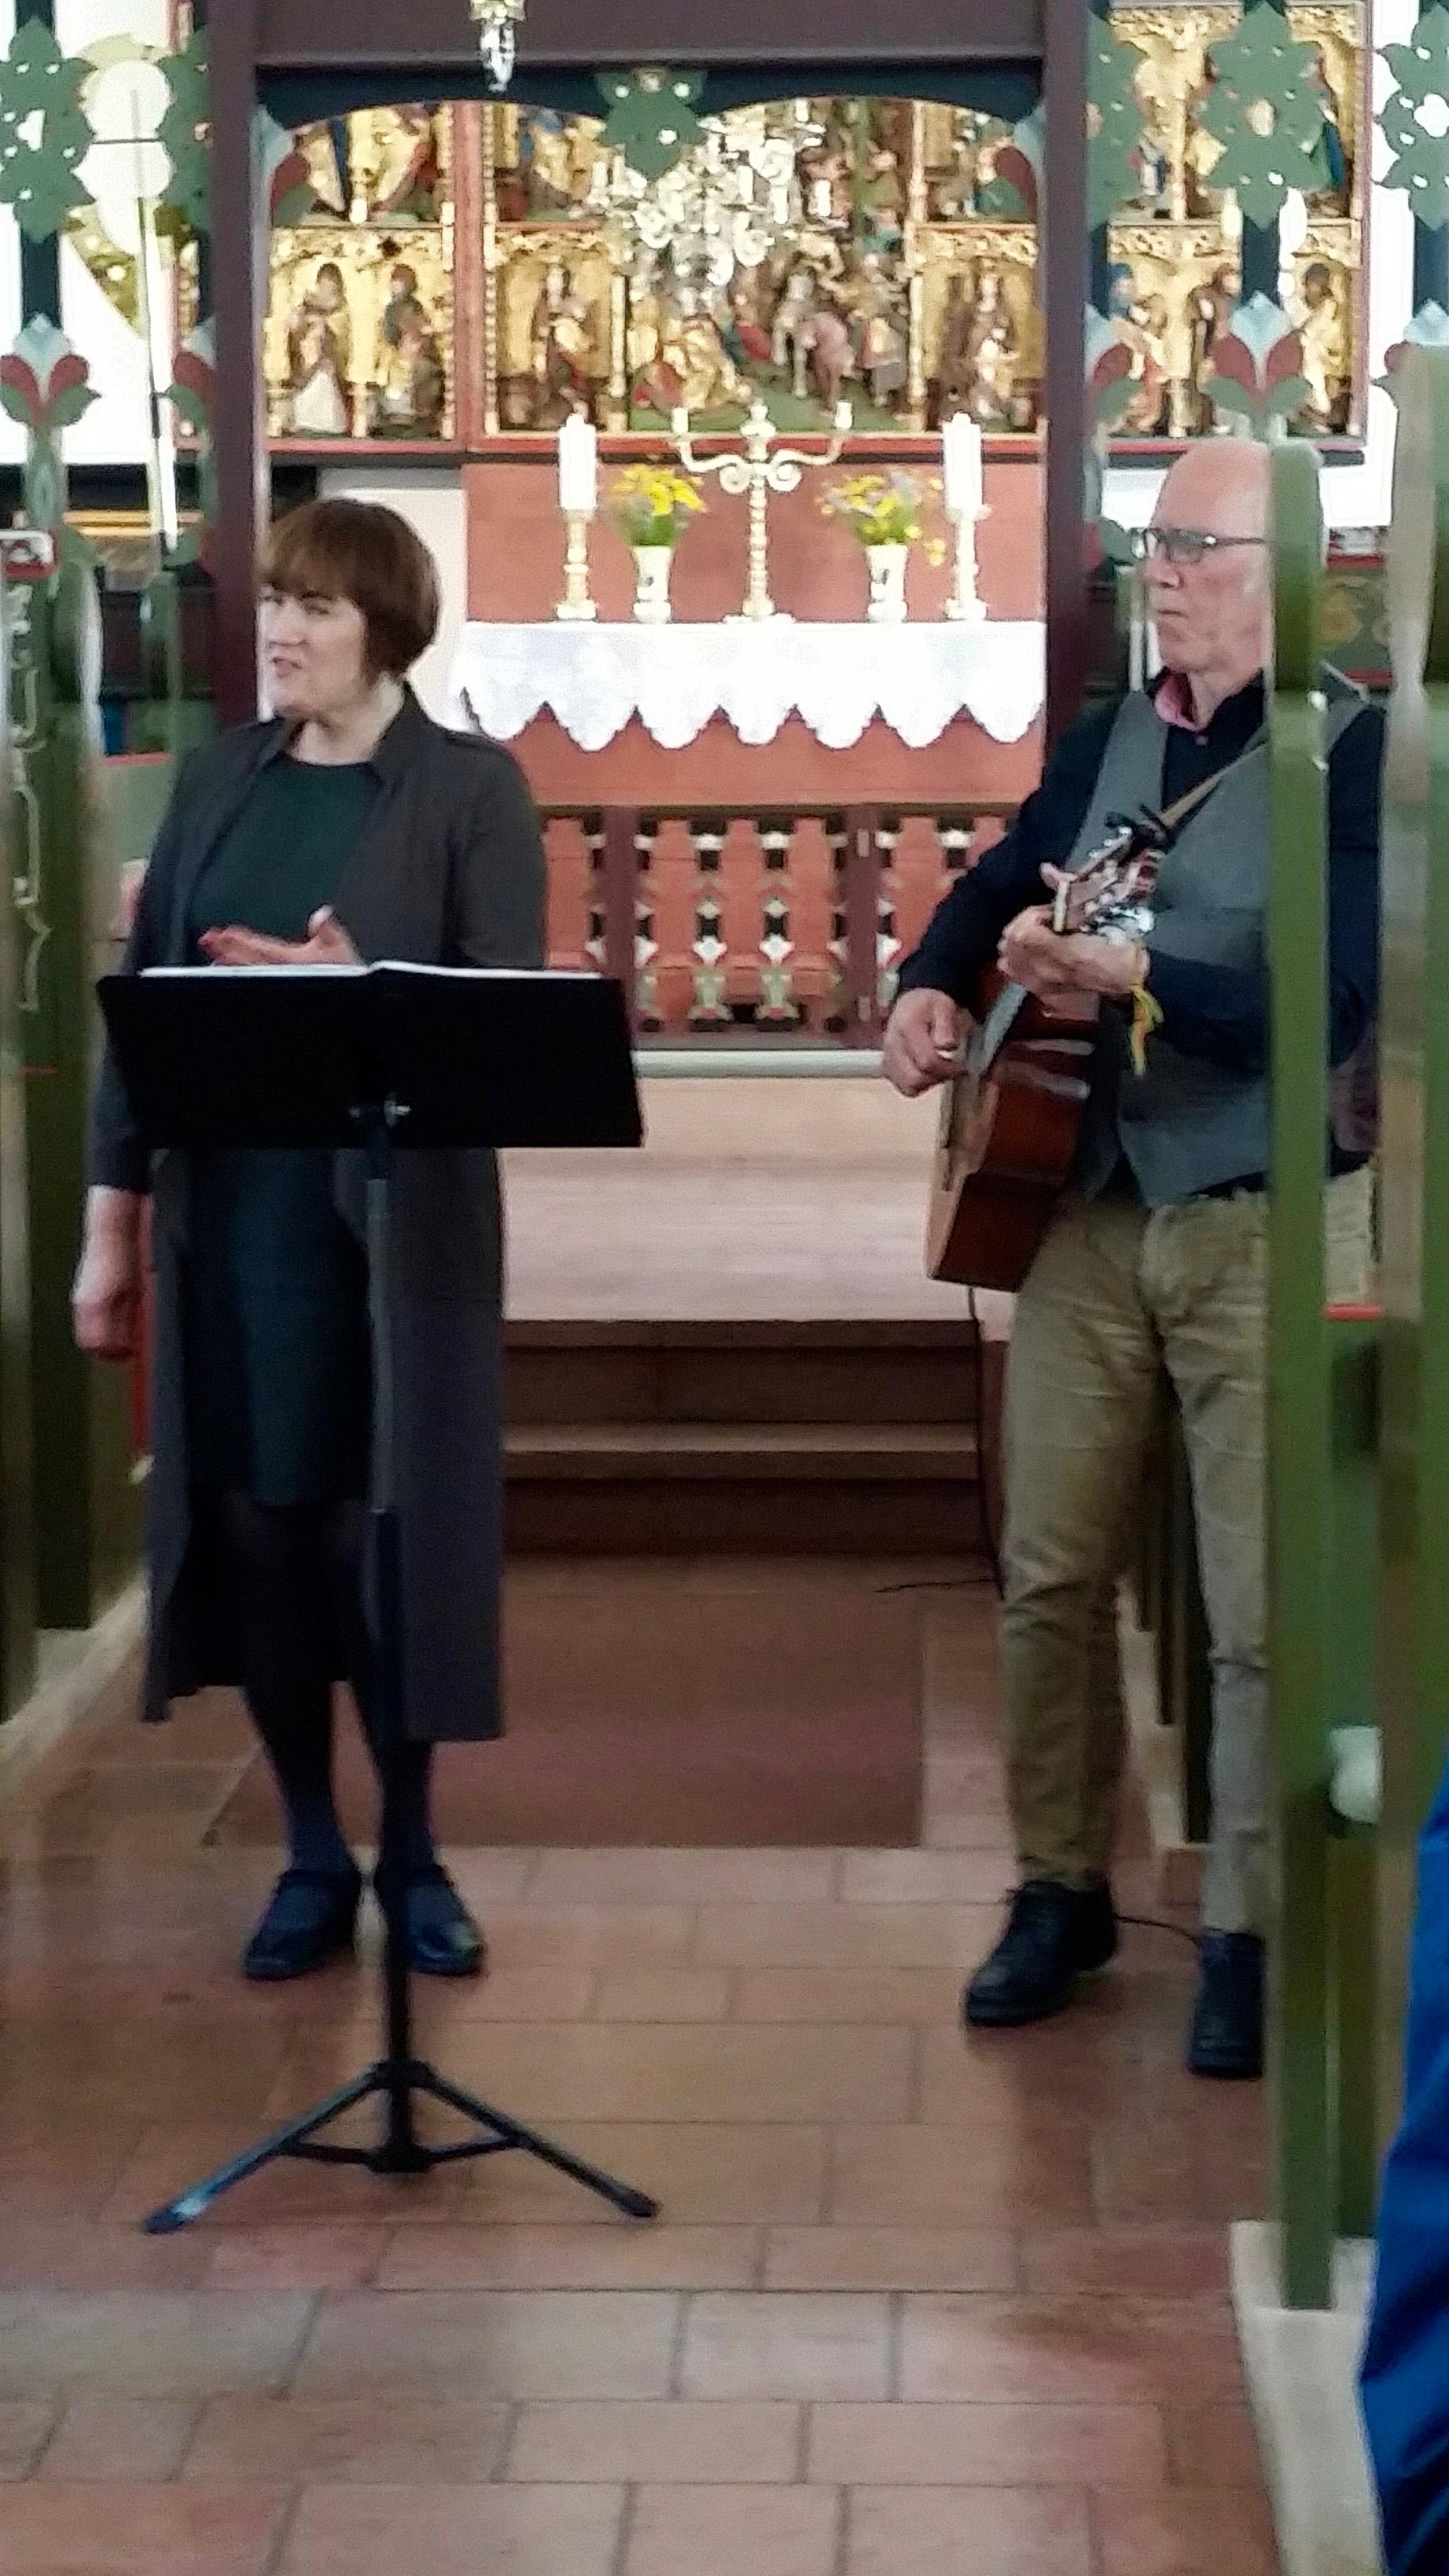 Kristjana Arngrímsdóttir and Kristján Hjartarson performing